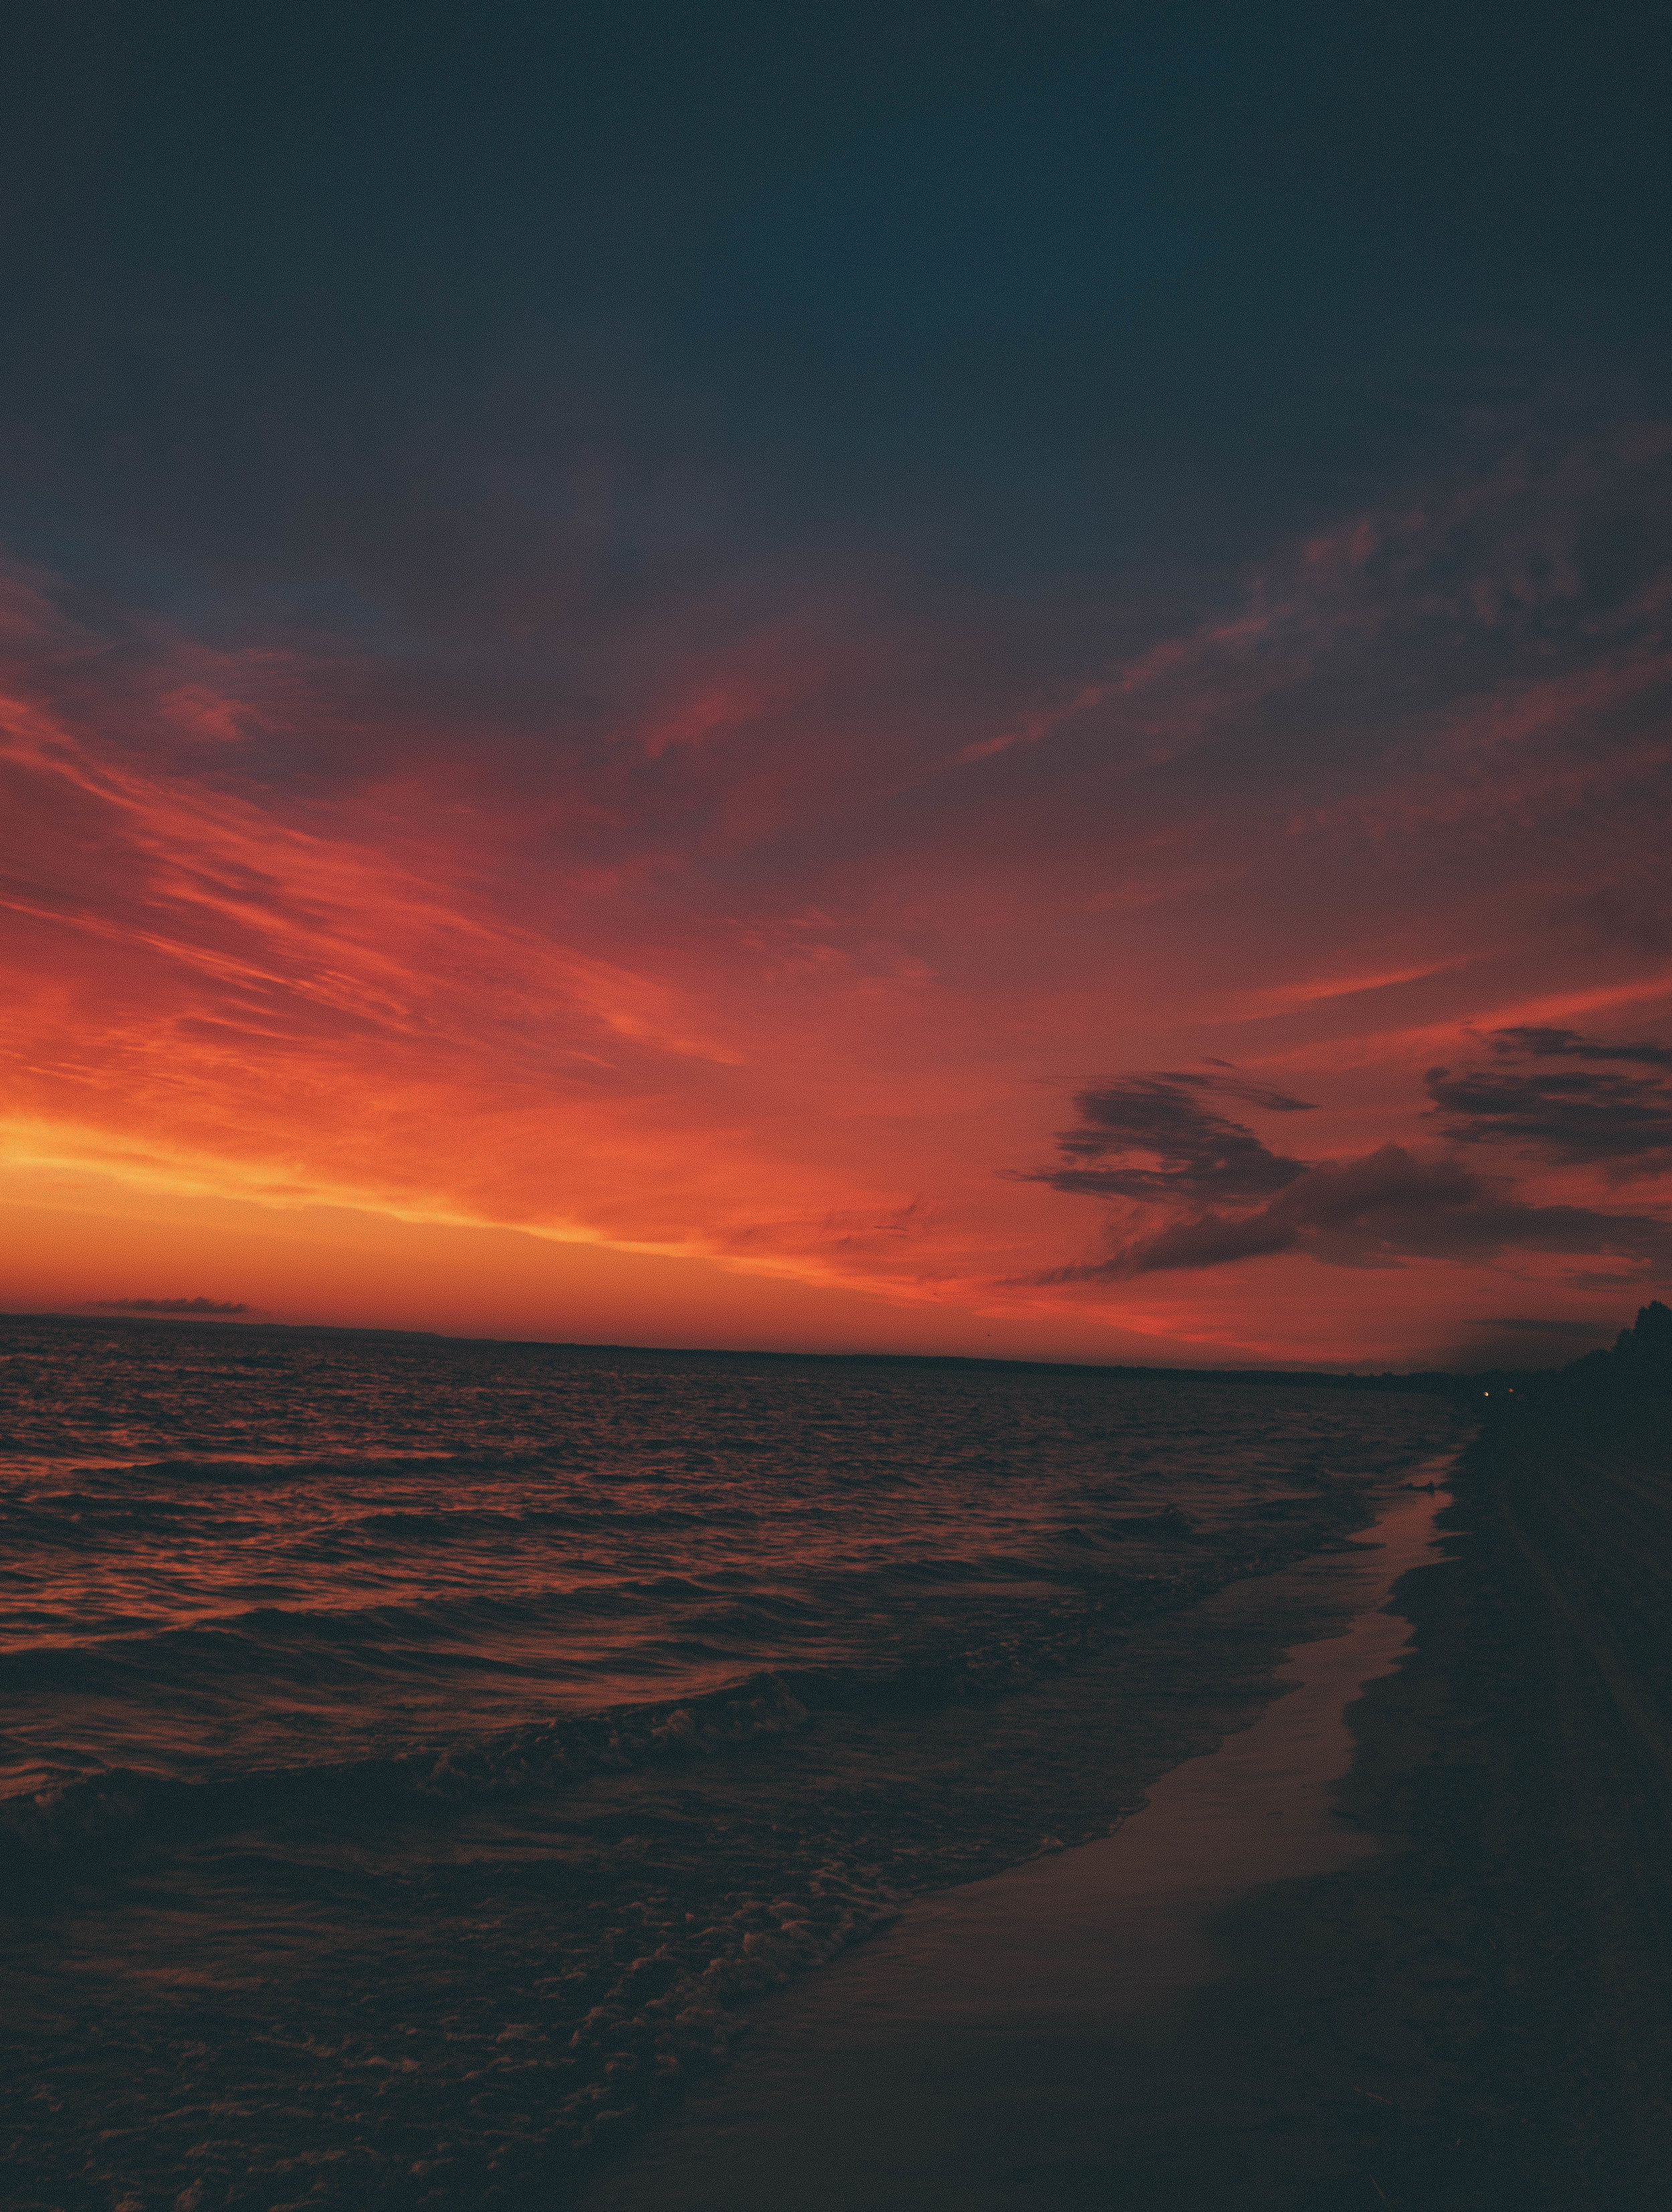 wasaga_beach_hero_image.jpg